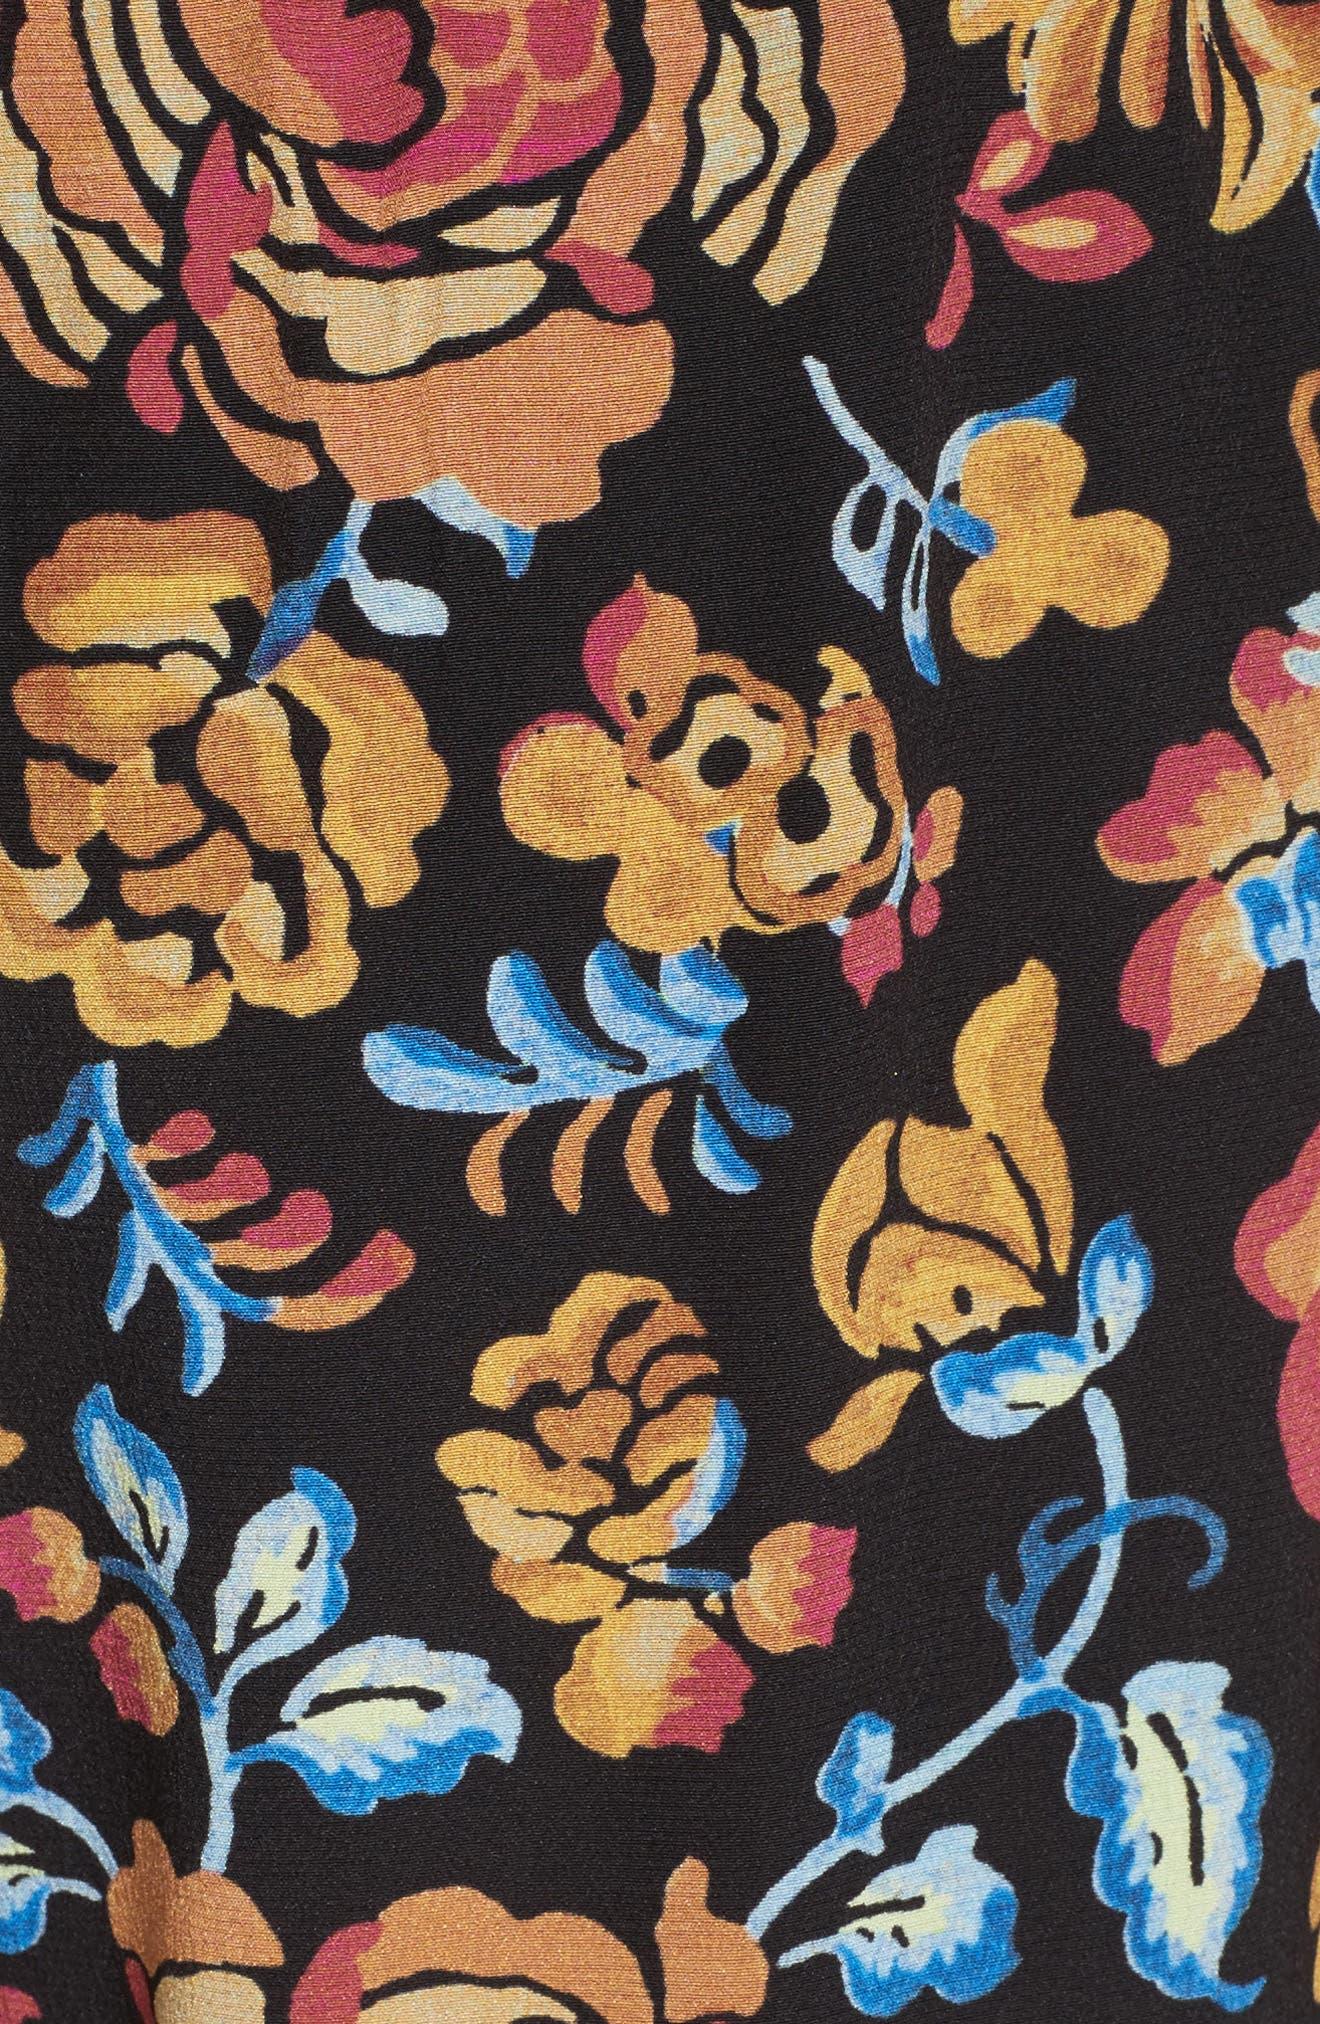 Floral Print Silk Pants,                             Alternate thumbnail 6, color,                             Black Multi